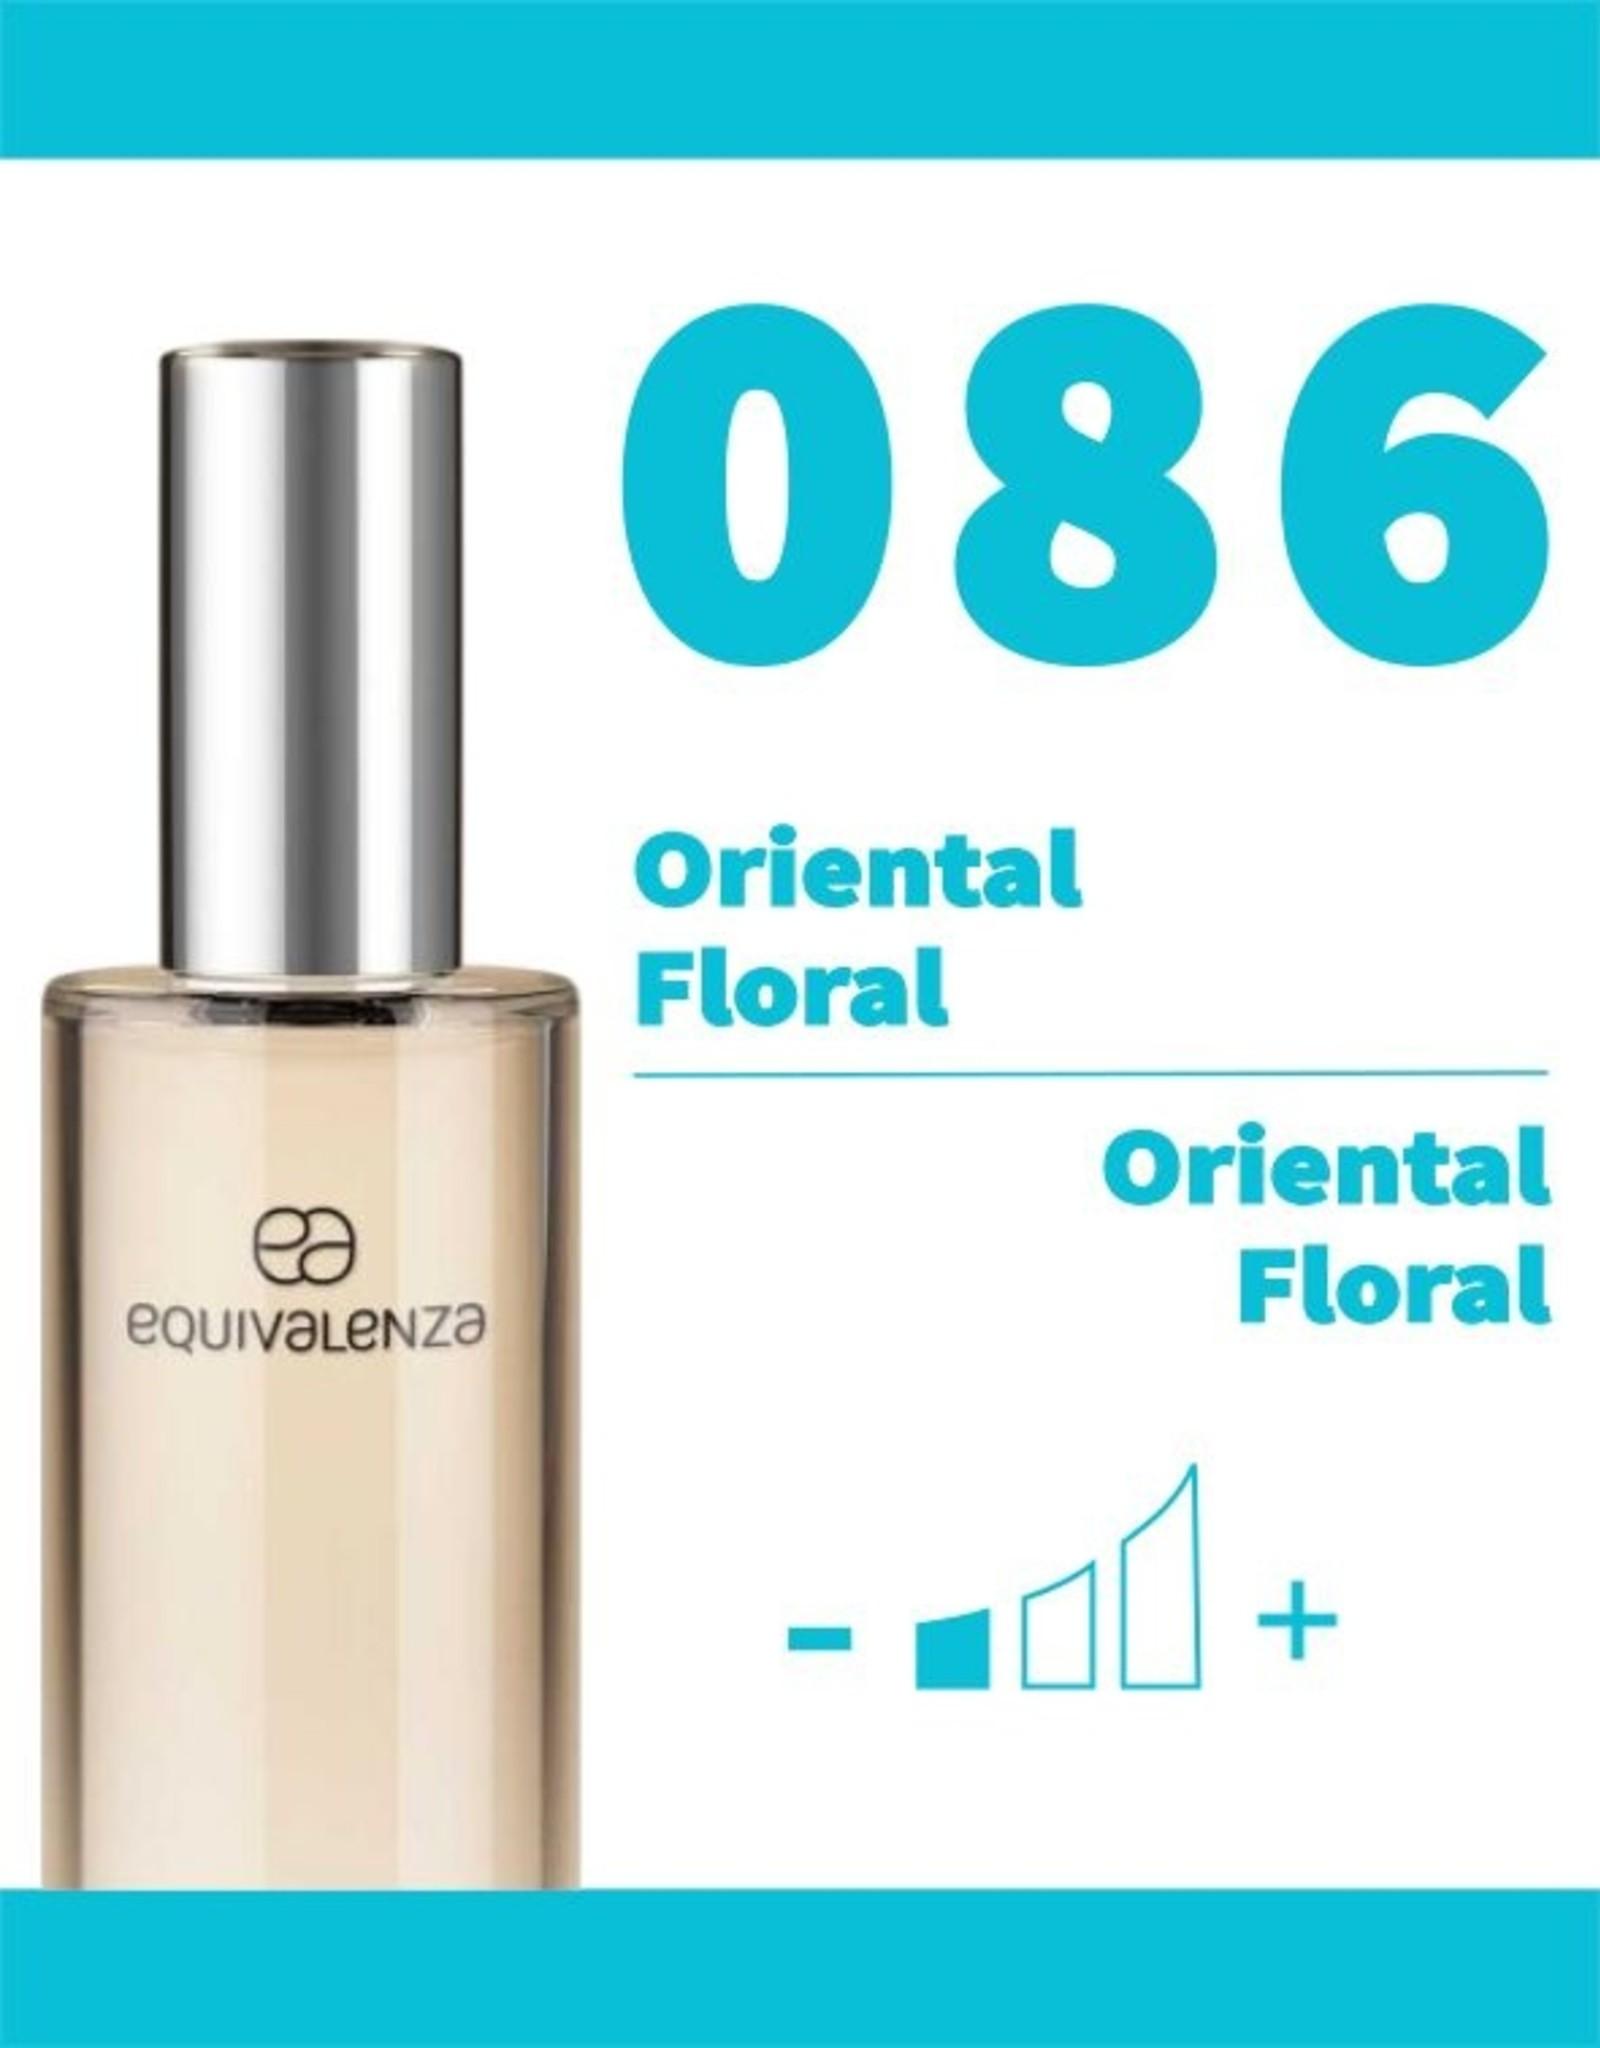 Equivalenza Oriental Floral 086